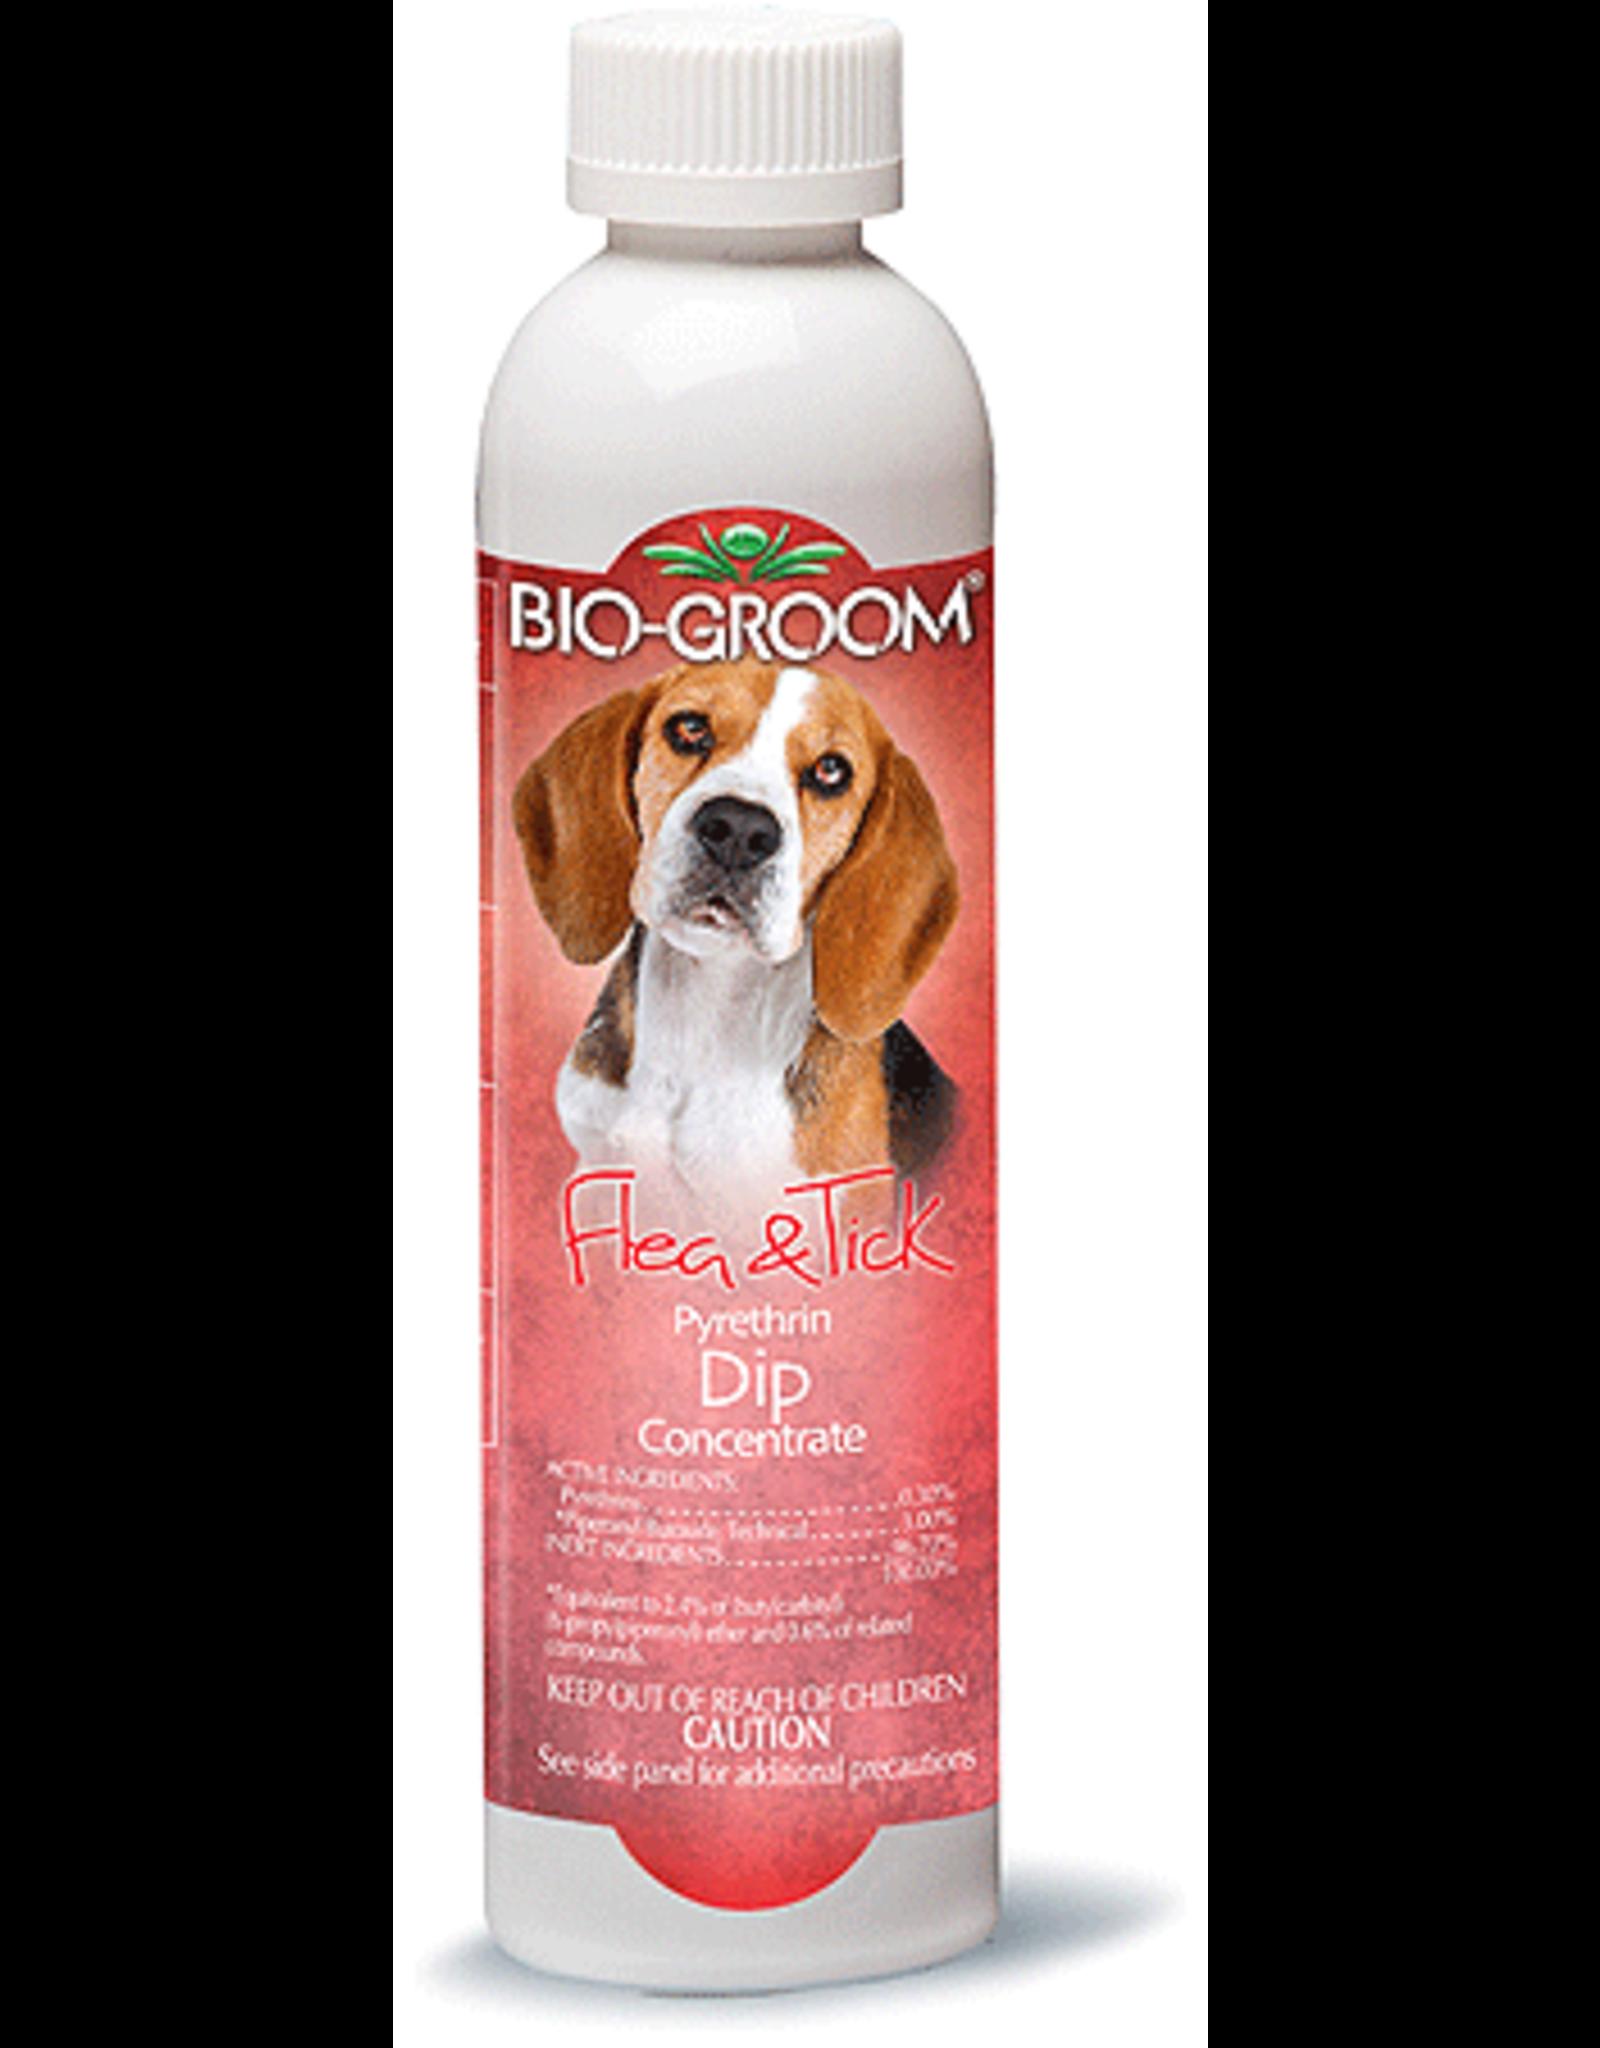 Biogroom BIOGROOM Pyrethrin FT Dip 8oz